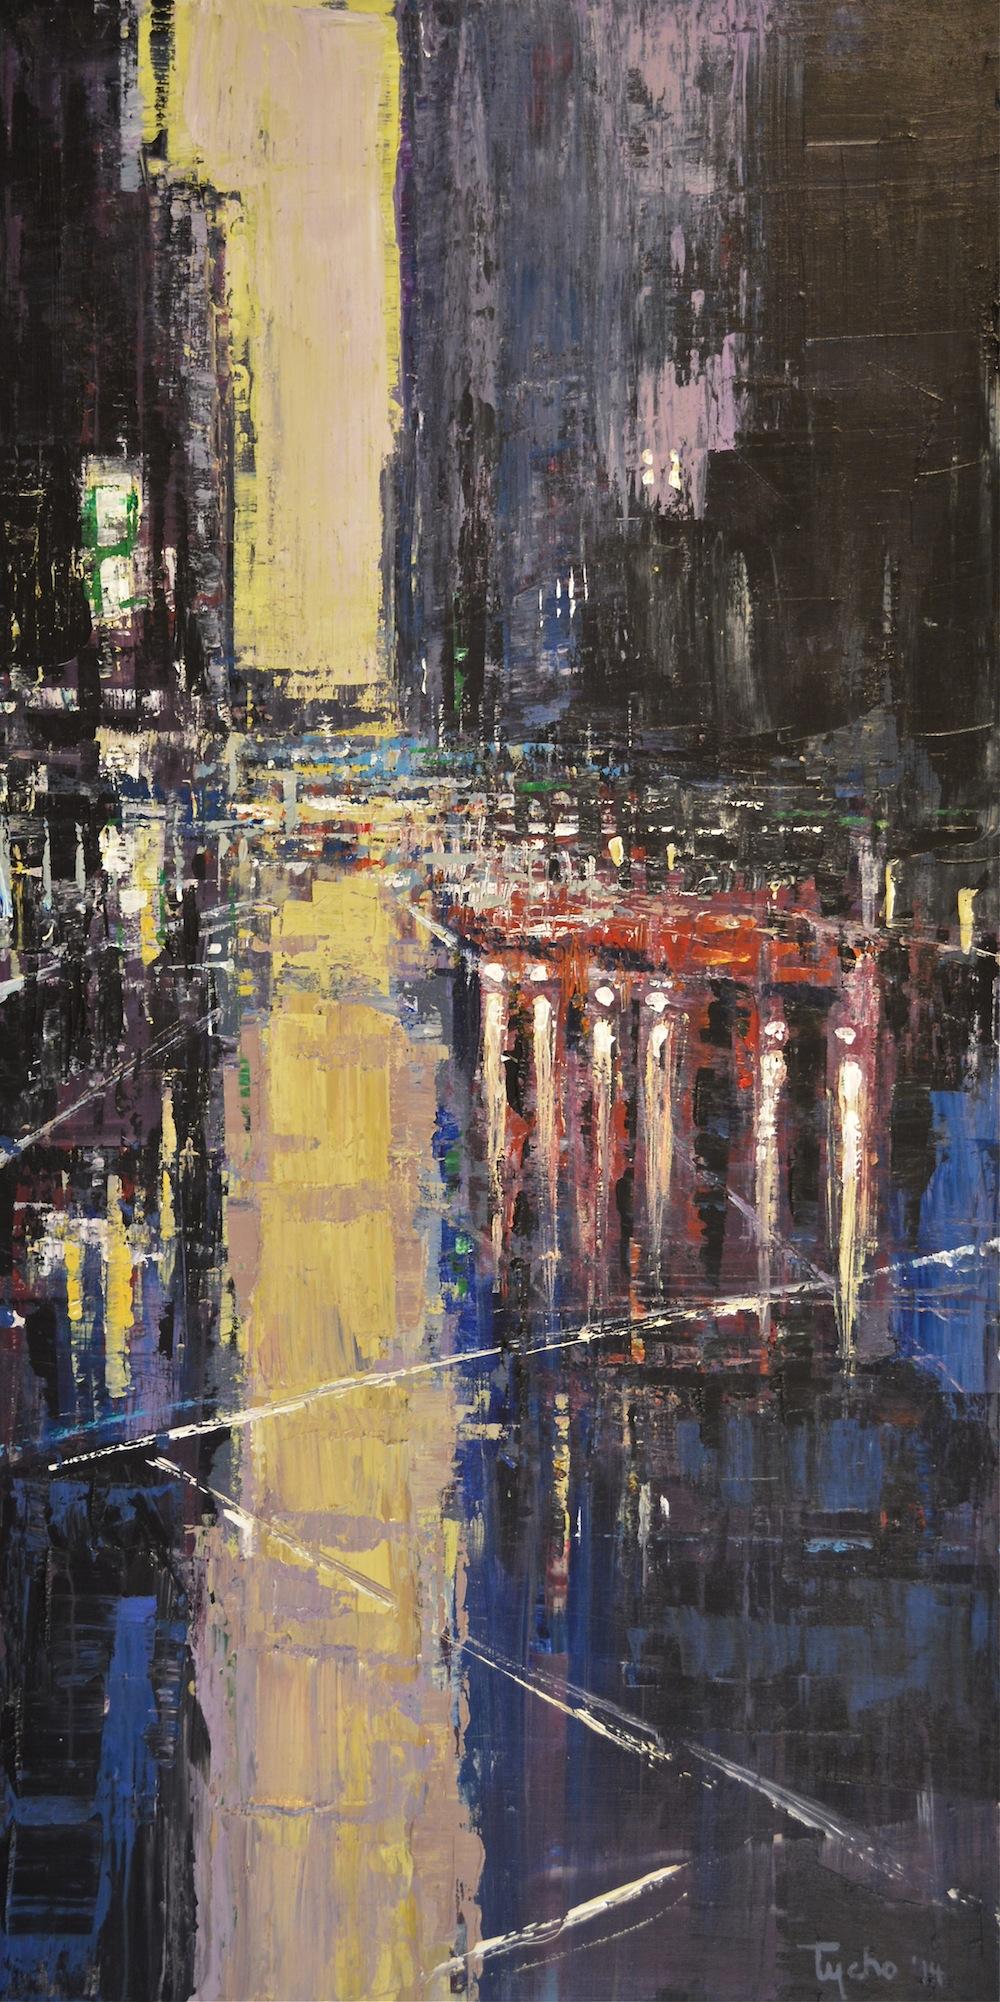 DTY-005, Urban Rhapsody #11, 48 x 24,2014, $3,600